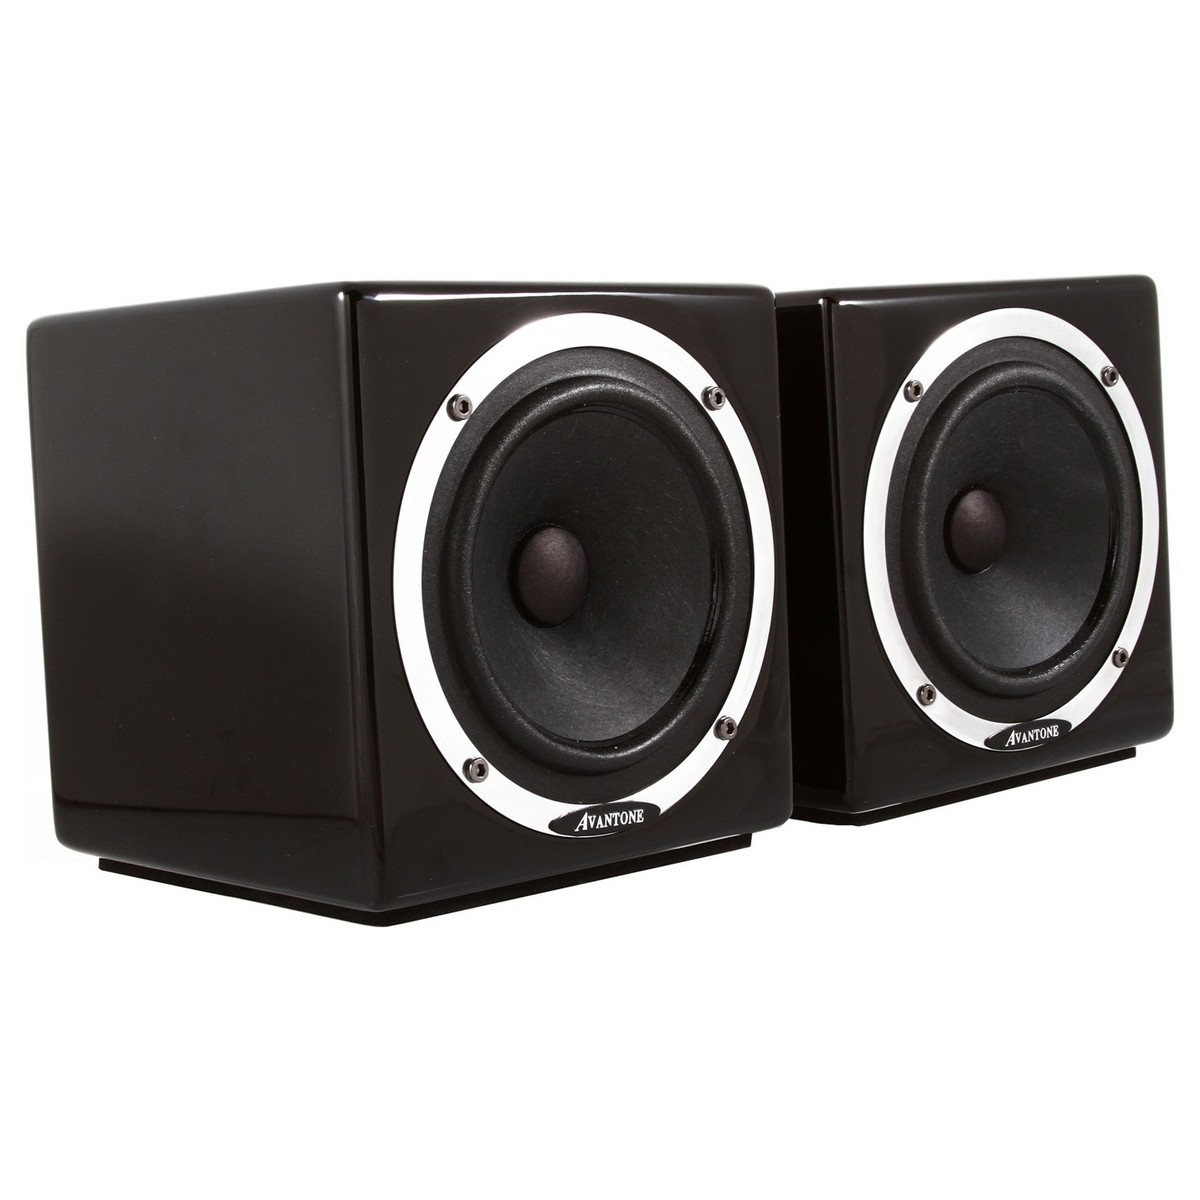 avantone mixcubes passive studio monitors black pair at gear4music. Black Bedroom Furniture Sets. Home Design Ideas